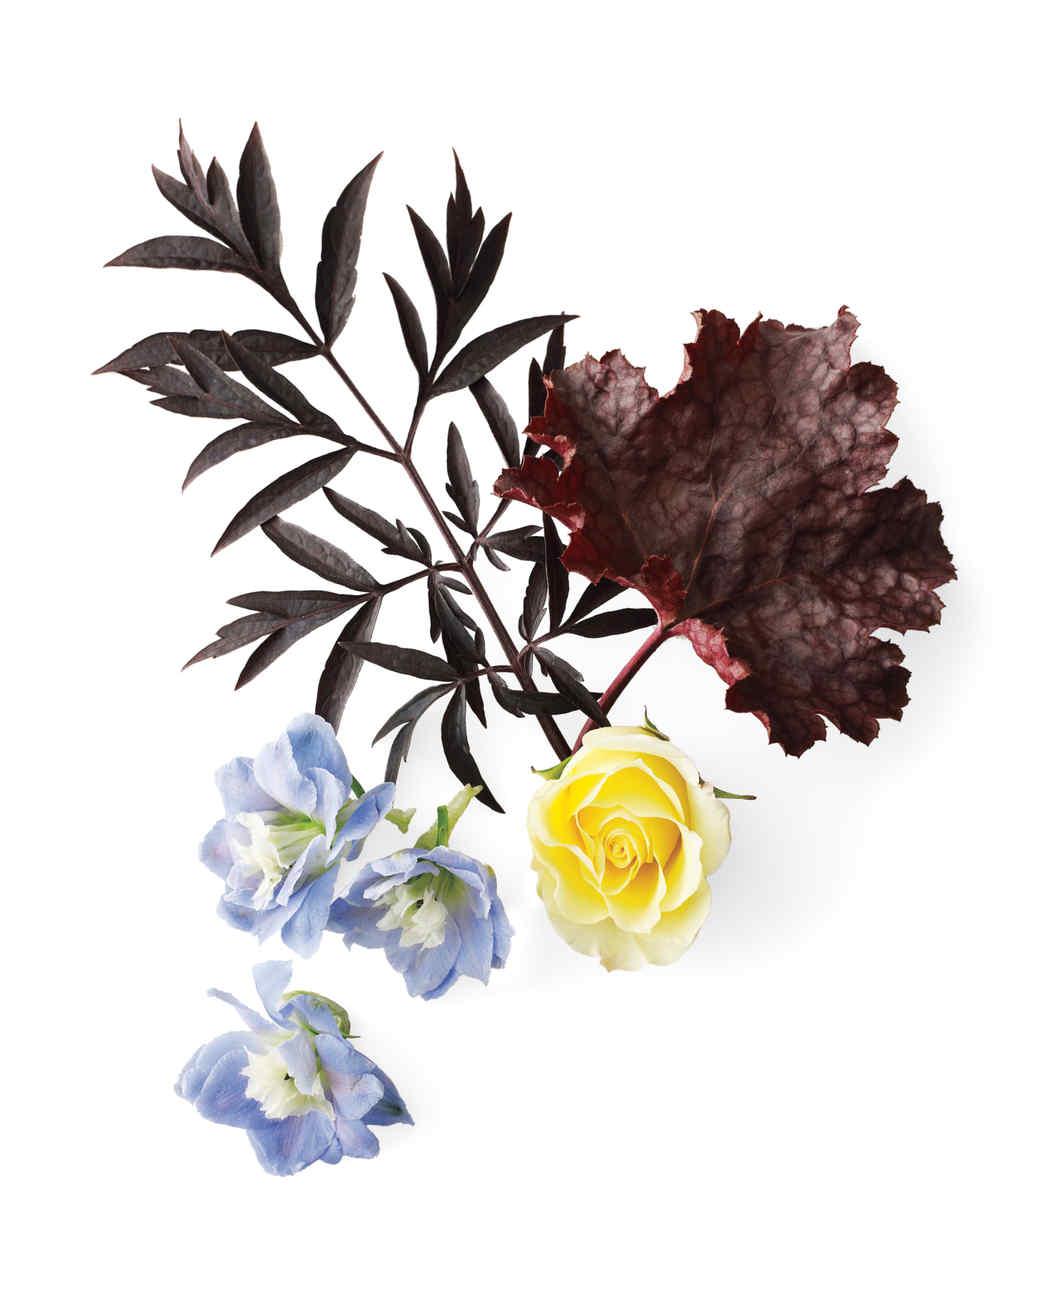 brown-yellow-blue-plants-mld108315.jpg